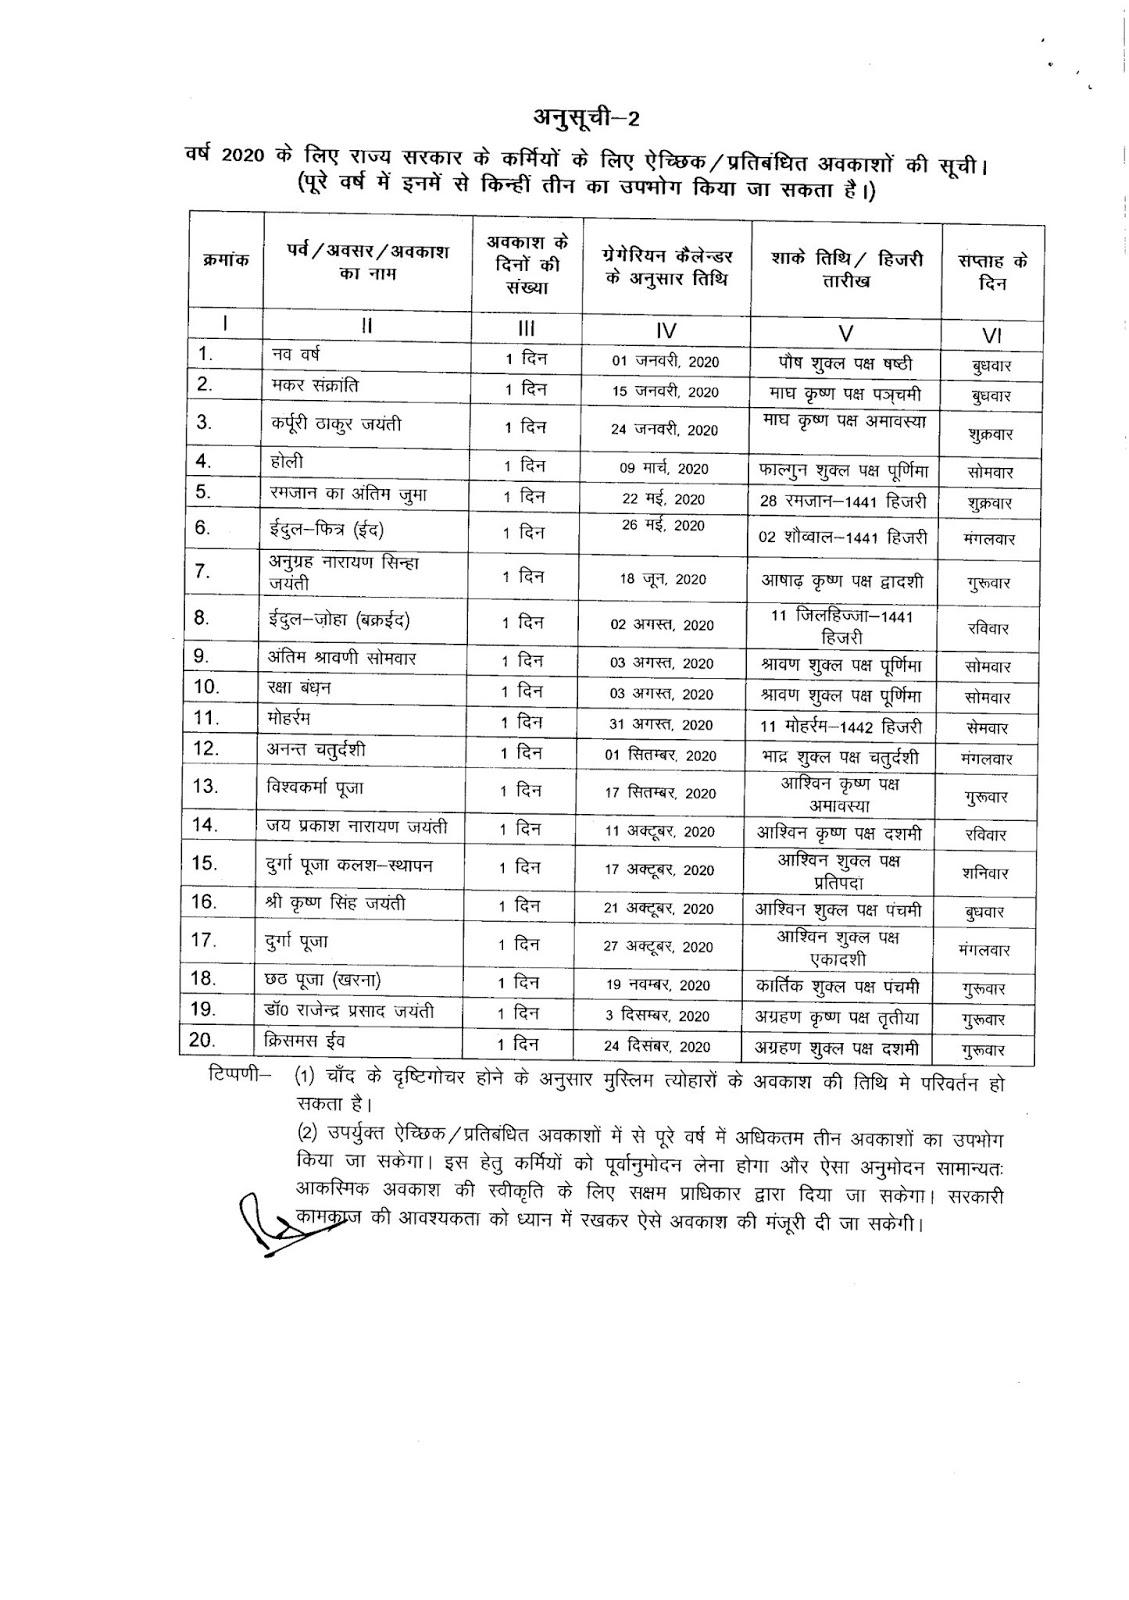 Bihar Government Calendar 2020 #educratsweb regarding Bihar Sarkar Ka Calendar 2020